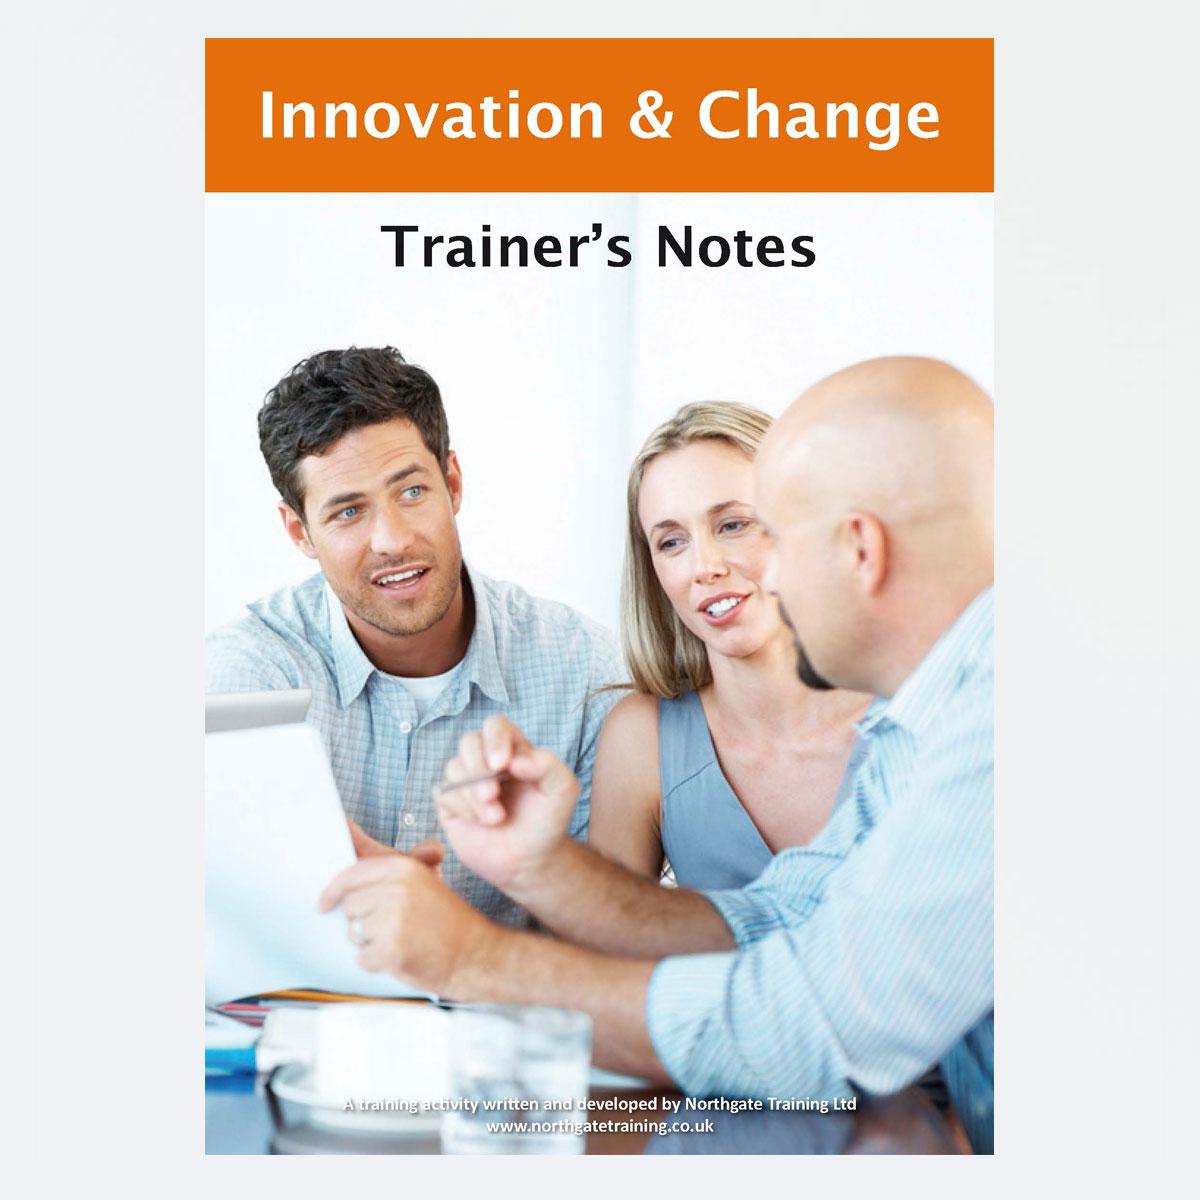 Innovation & Change